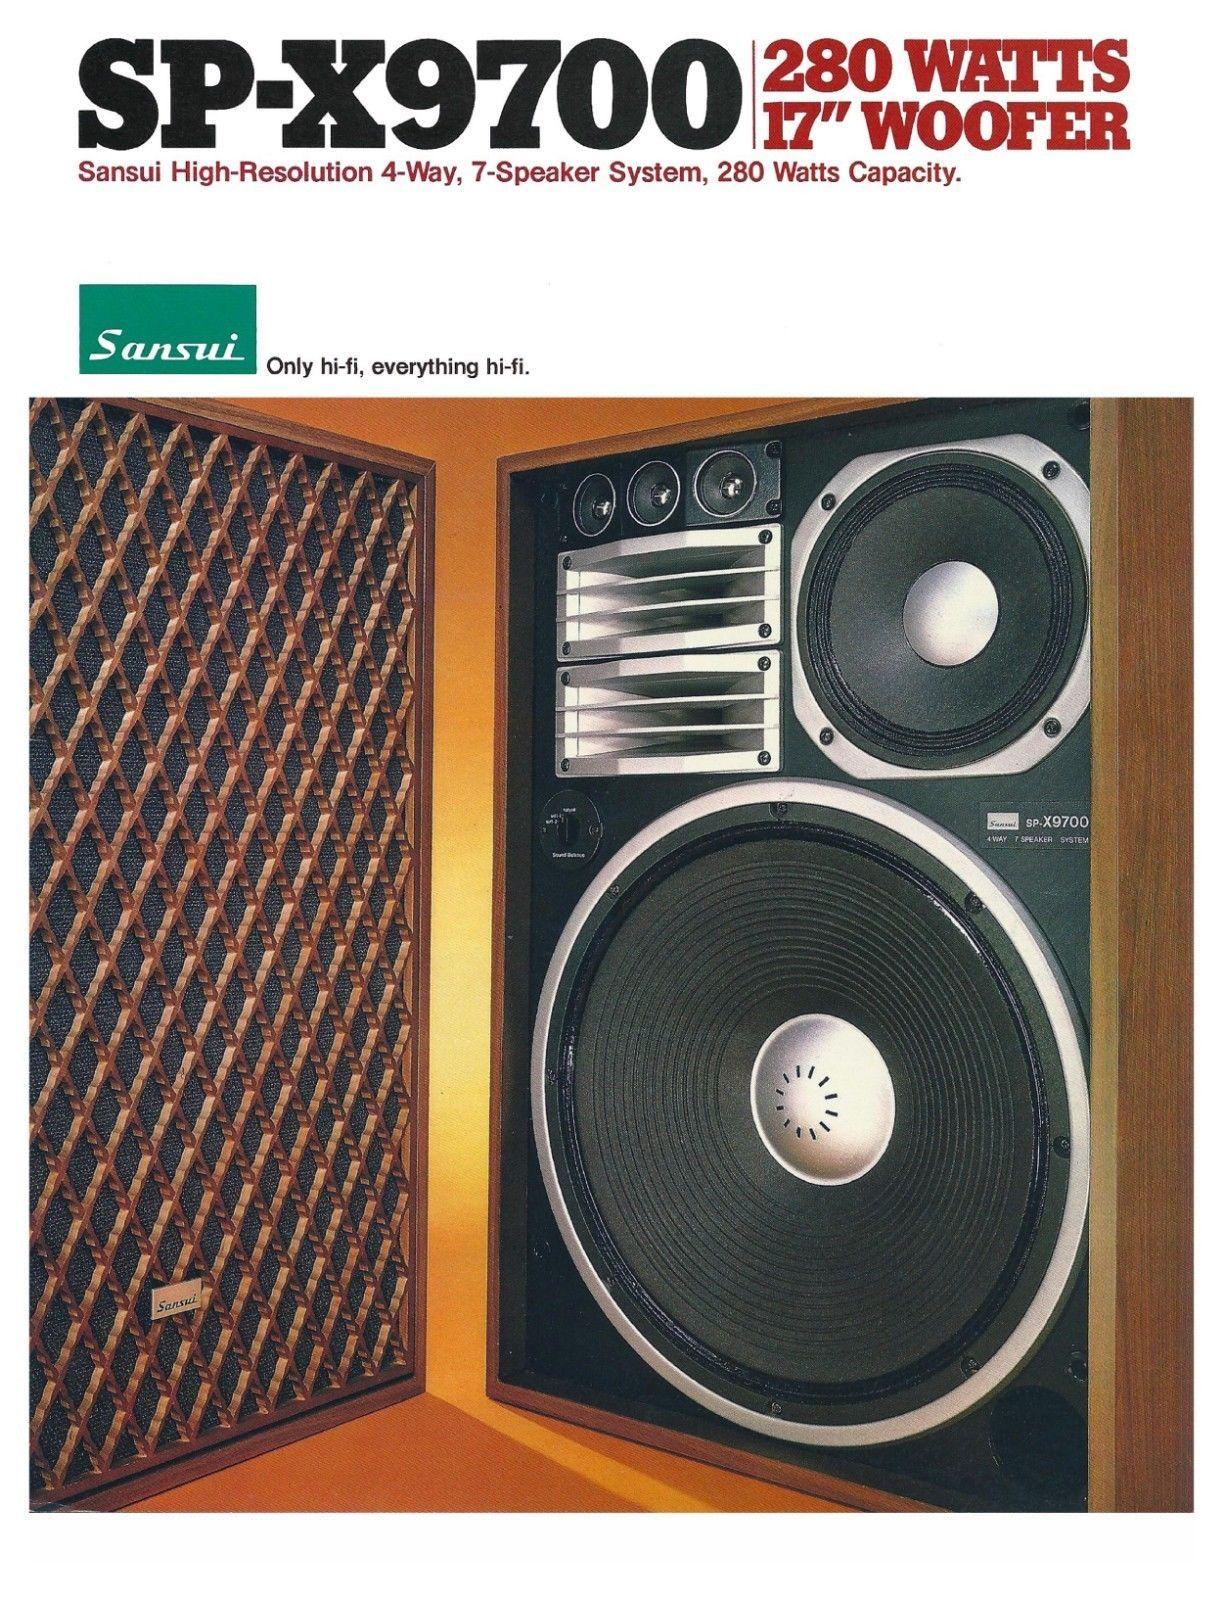 Sansui Vintage Speakers Best Hifi Speakers Vintage Electronics